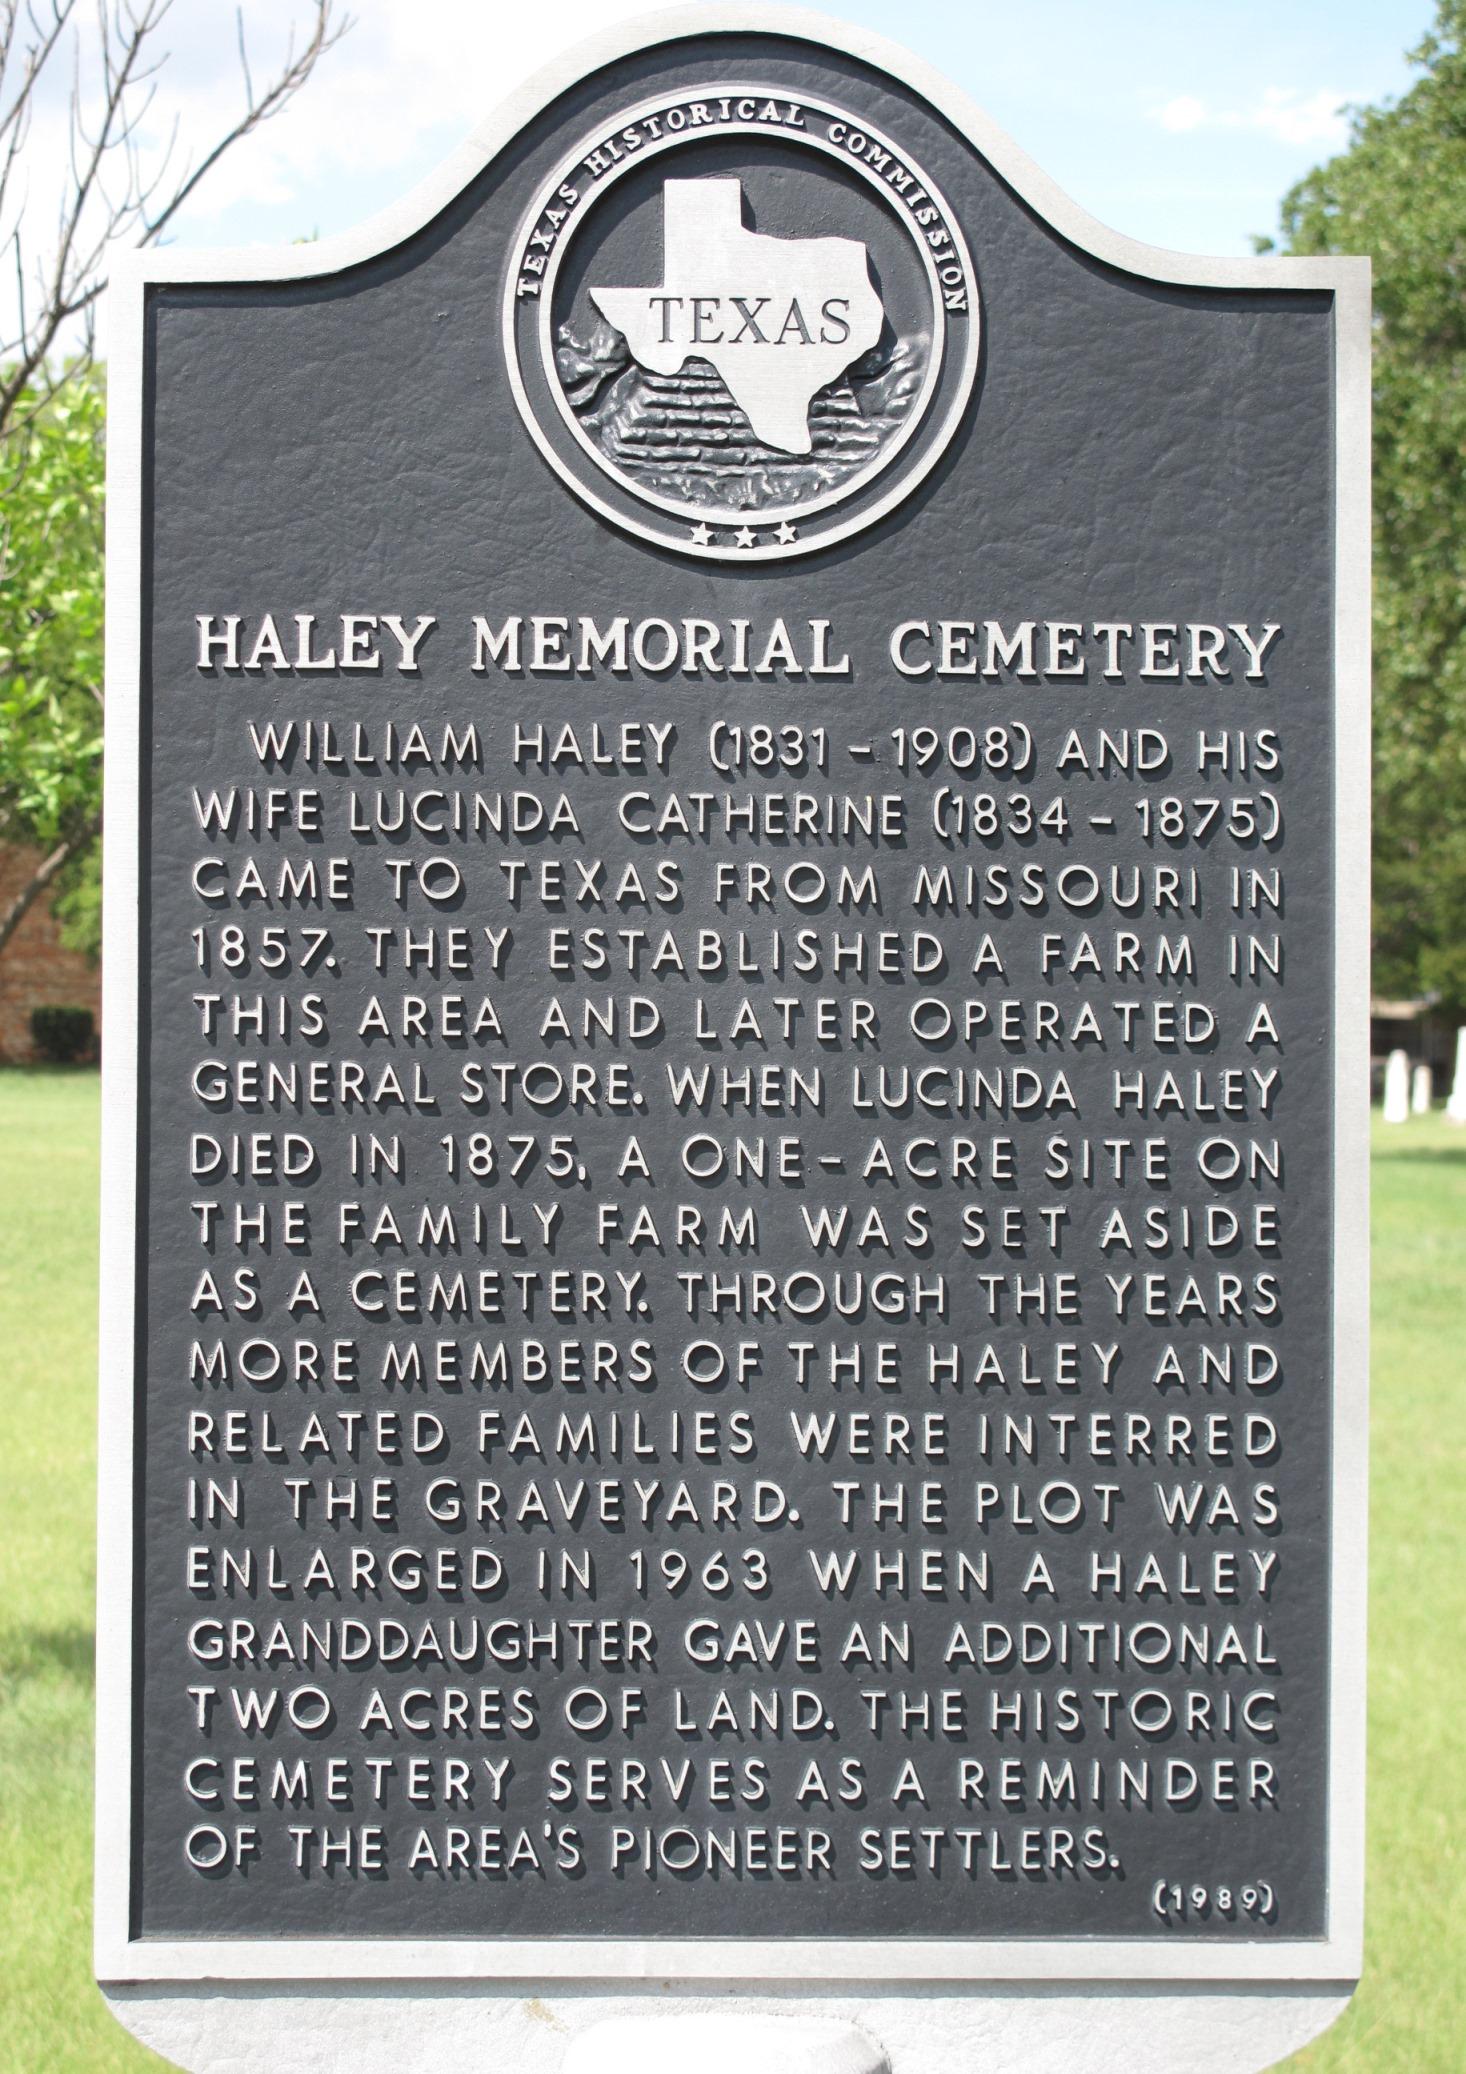 Haley Memorial Cemetery